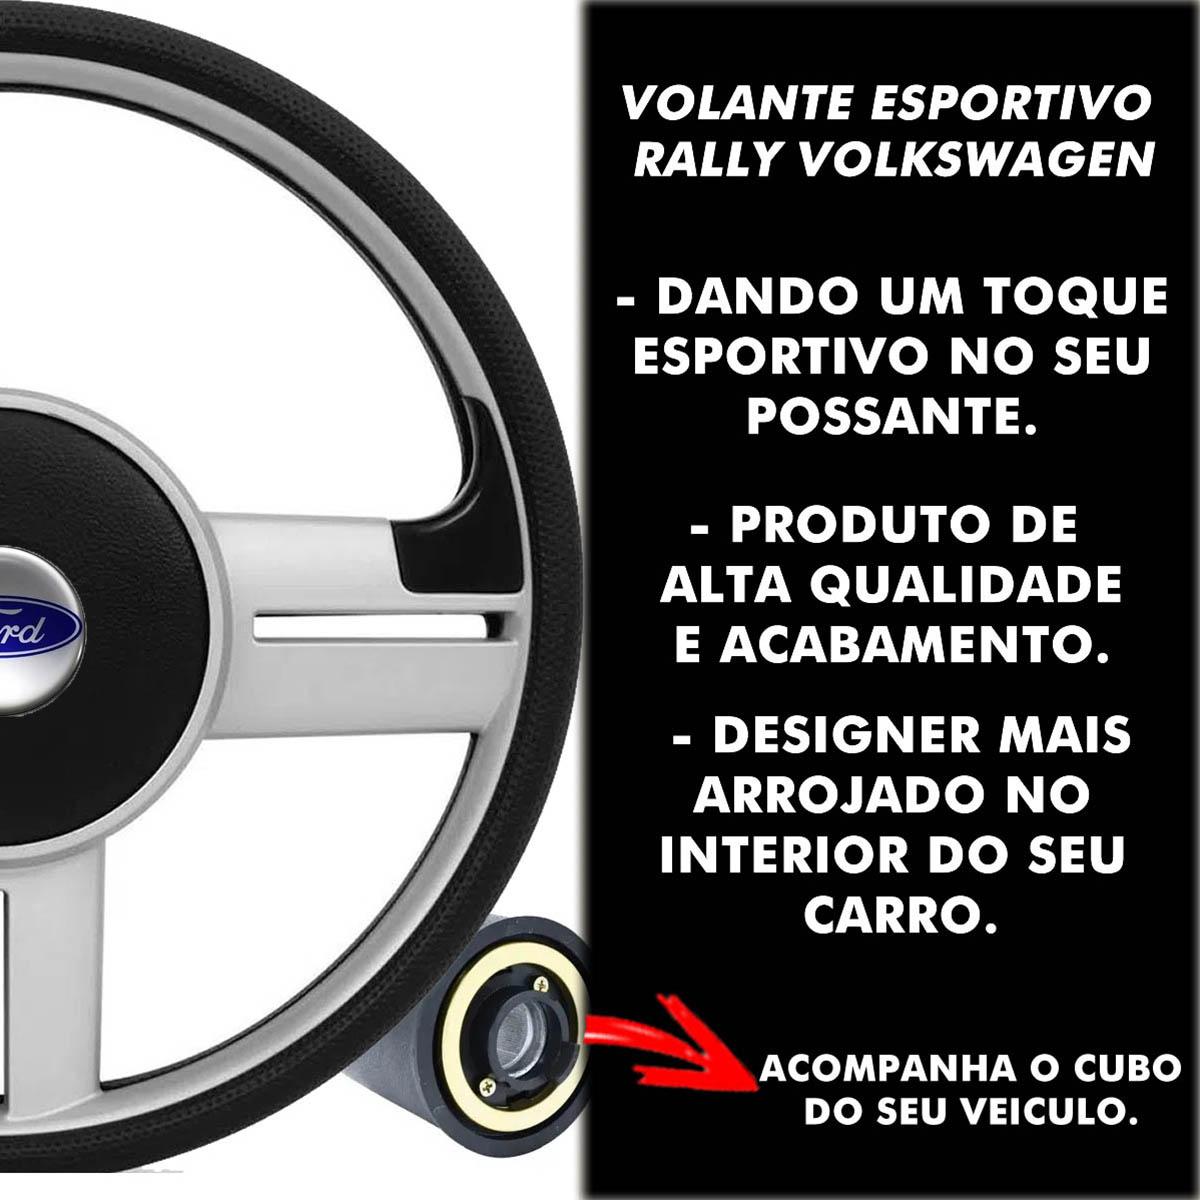 Volante Ford Surf Rallye Esportivo Cubo Fiesta Ka Ecosport Escort Hobby Zetec F100 F1000 F75 F250